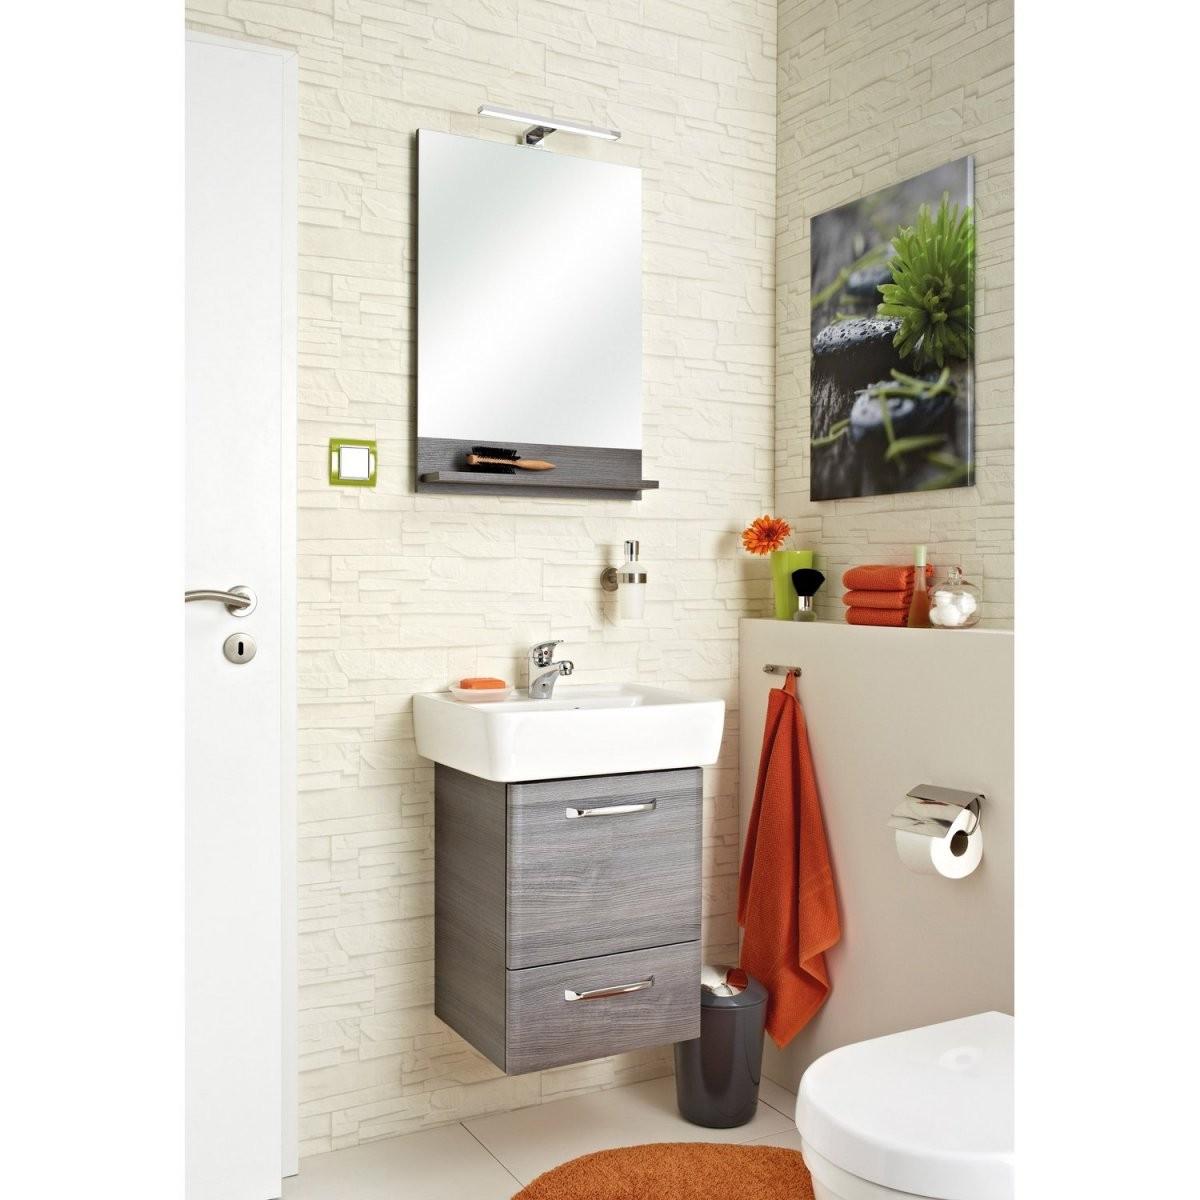 Pelipal Waschbeckenunterschrank 40 Cm Alika Graphit Kaufen Bei Obi von Waschbeckenunterschrank 40 Cm Breit Bild